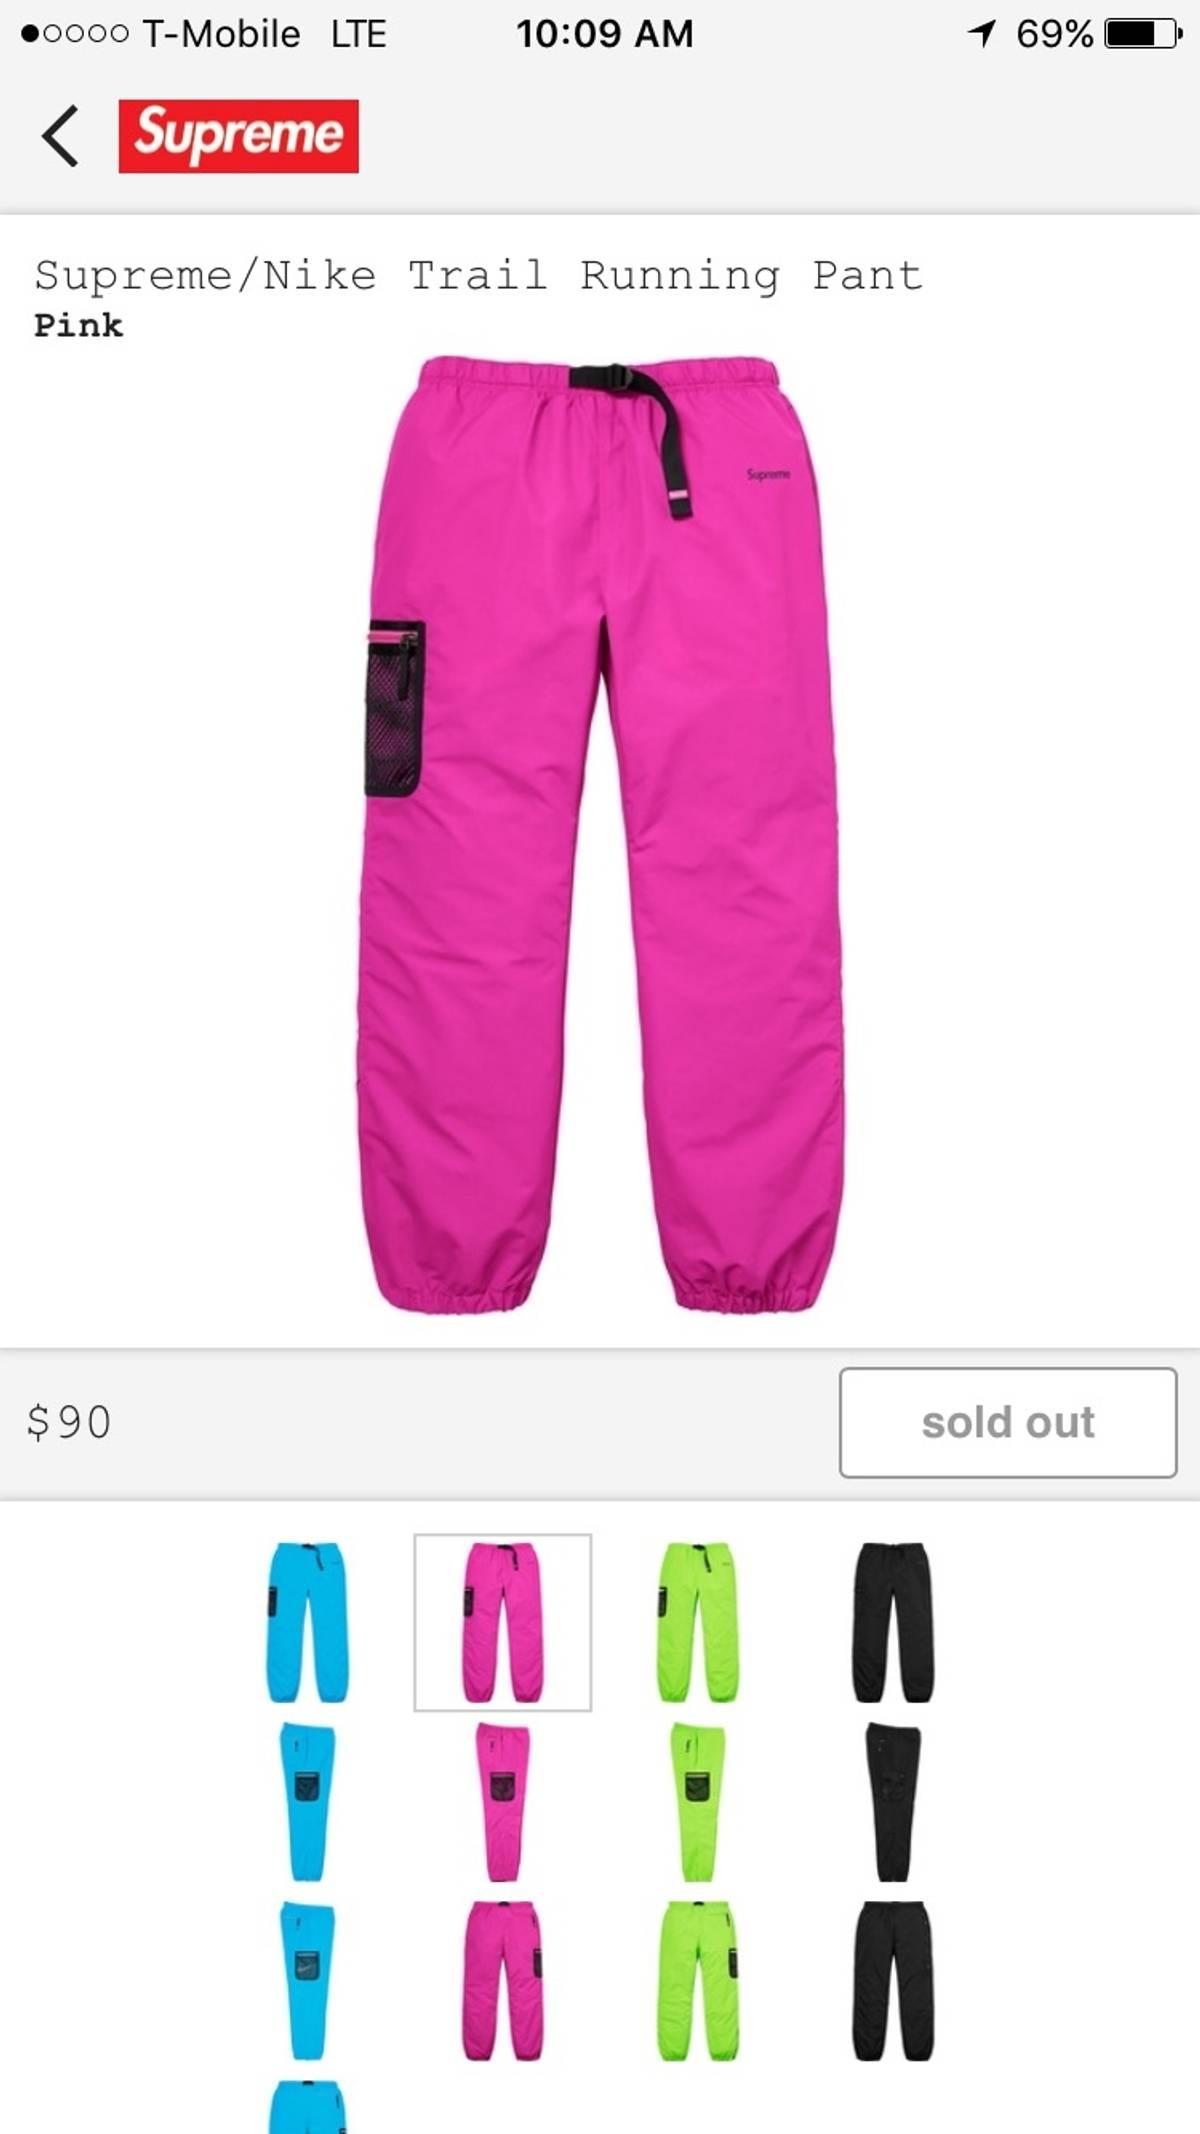 cc091fda8440c ... Supreme Supreme X Nike Humana Track Pants Pink Size 34 - Sweatpants  Joggers for Sale ...